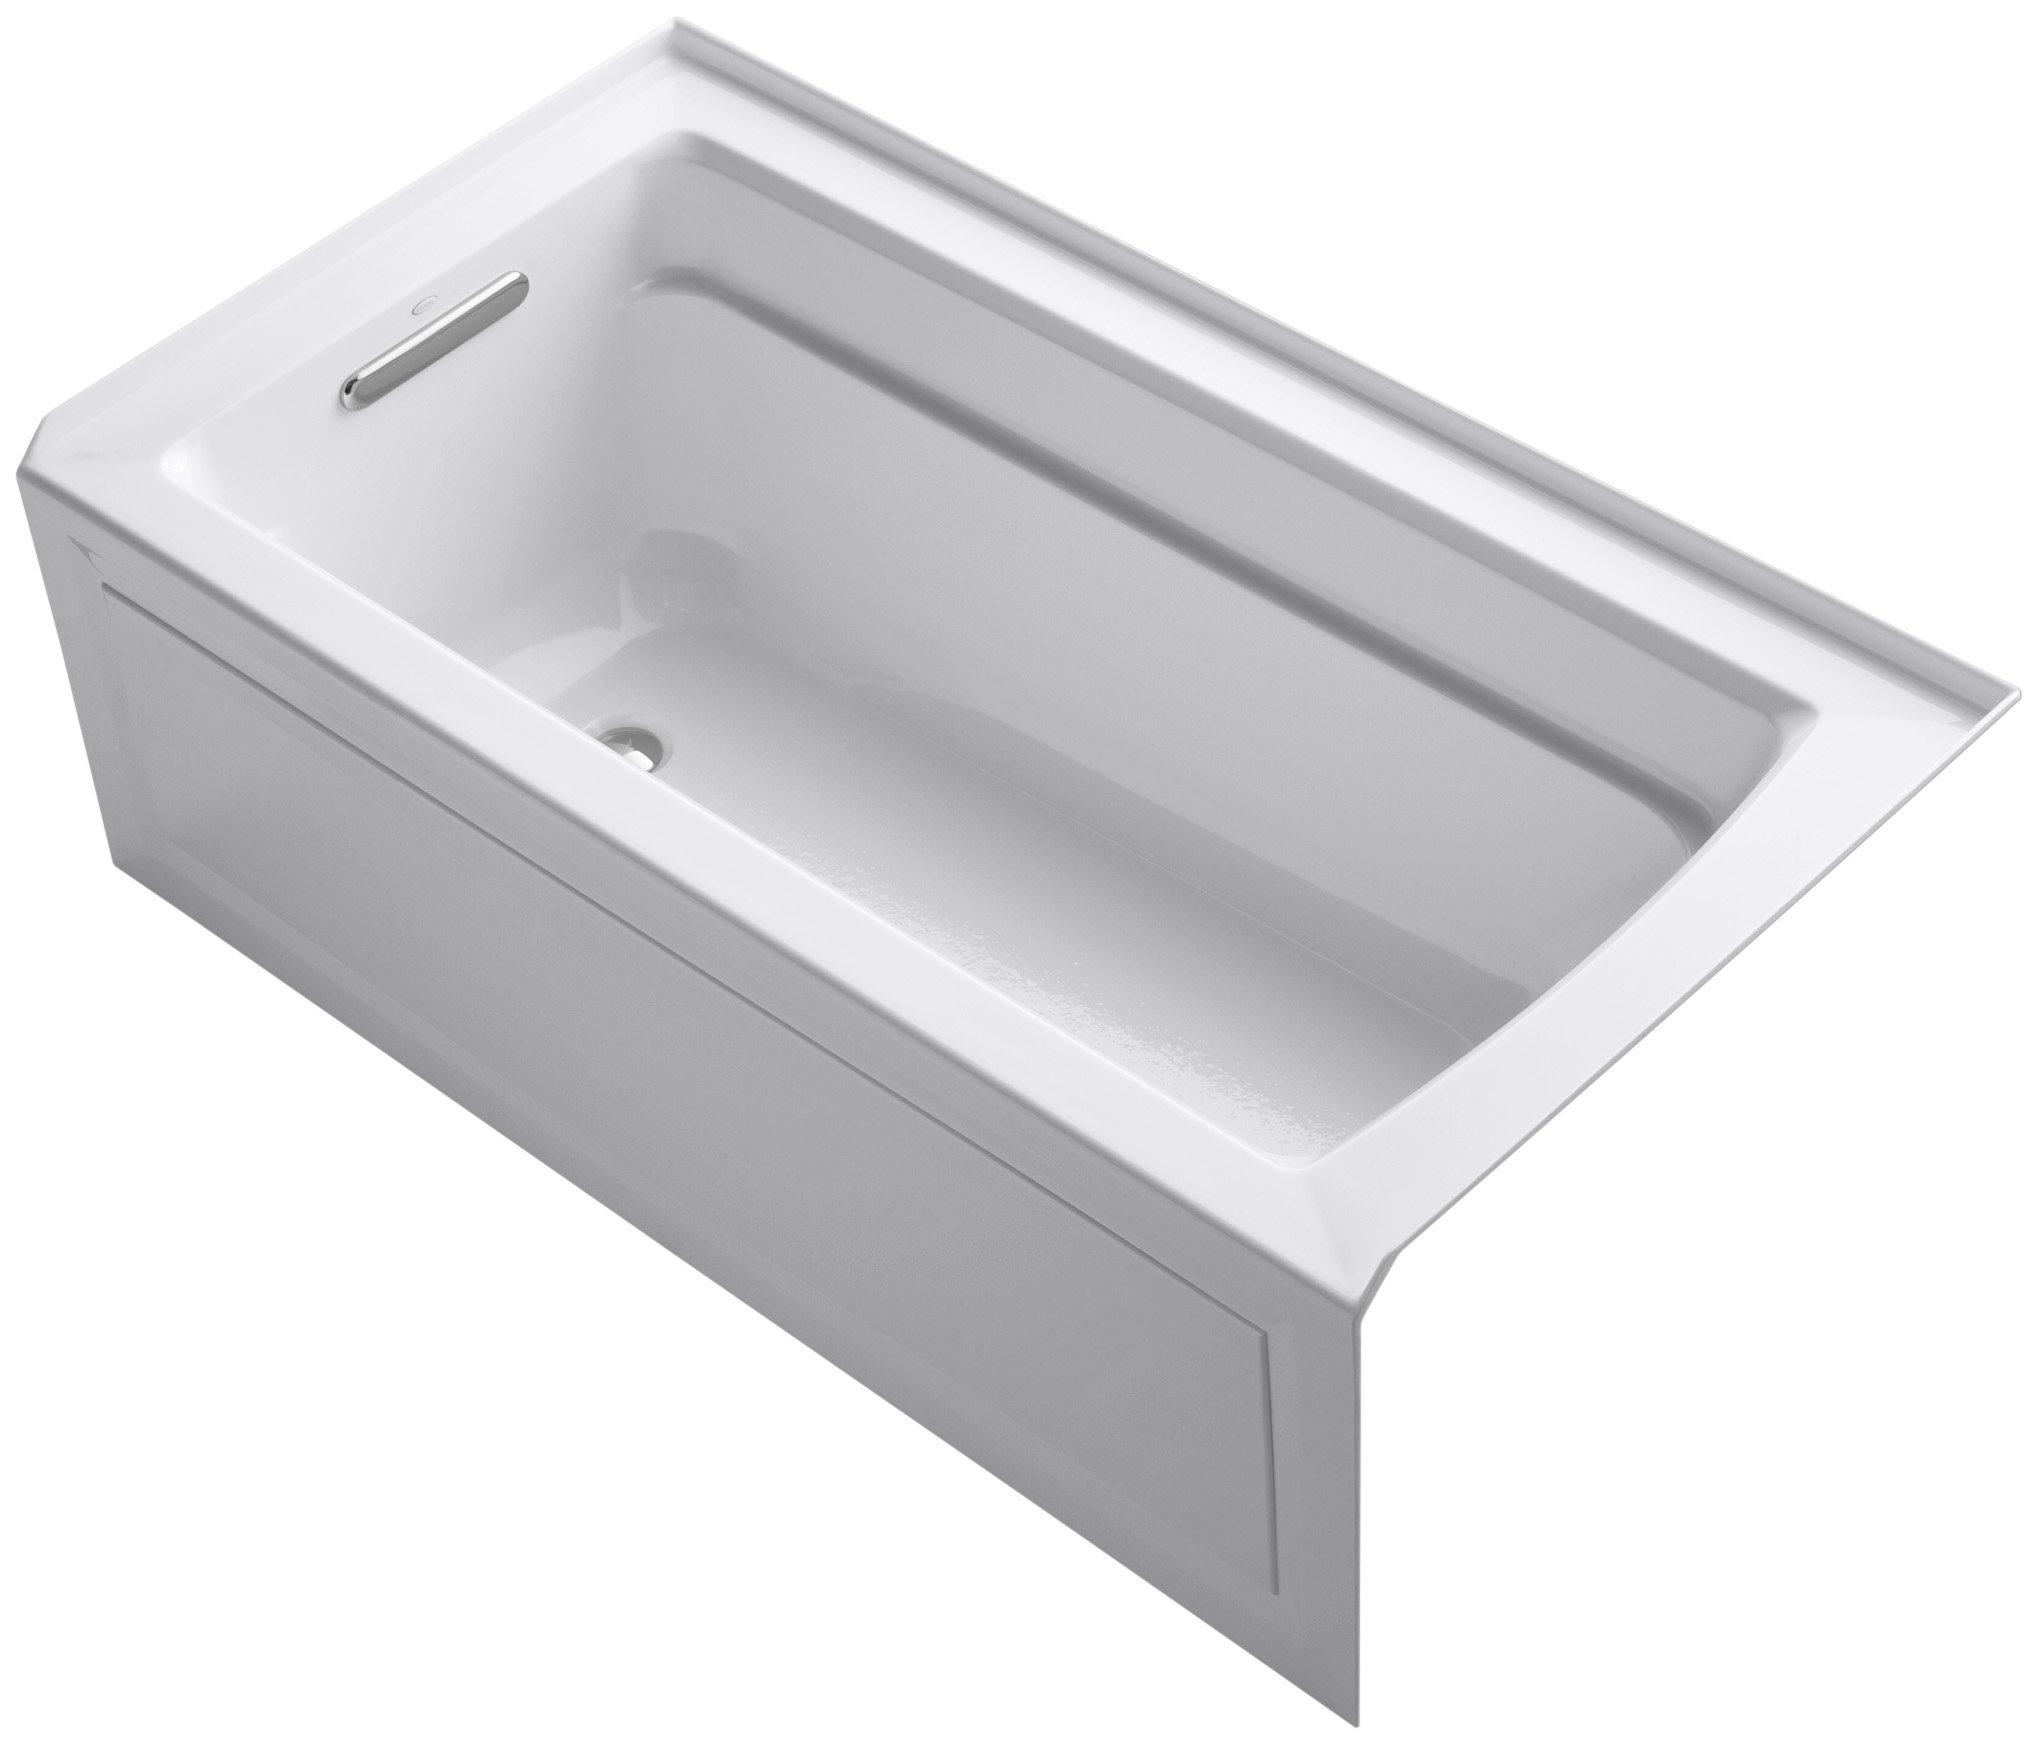 KOHLER K-1123-LA-0 Archer 5-Foot Bath, White by Kohler